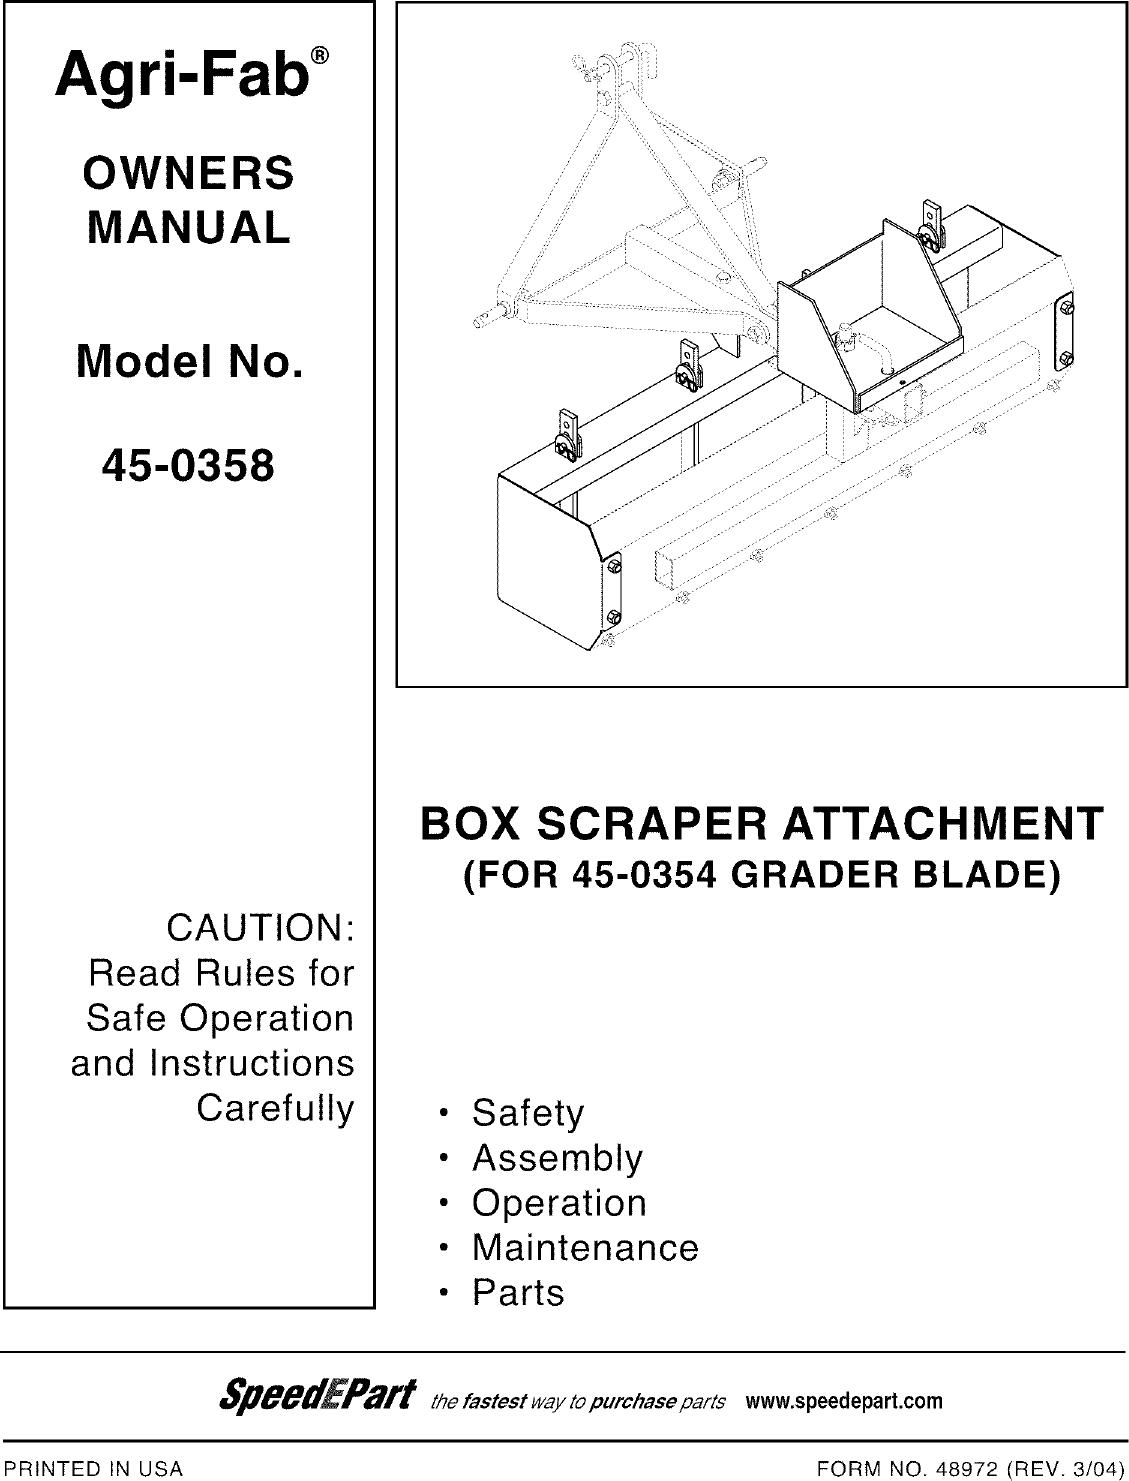 agri fab 45 0358 user manual box scraper attachment manuals and rh usermanual wiki Agri-Fab Mow-N-Vac Agri-Fab Snow Blowers